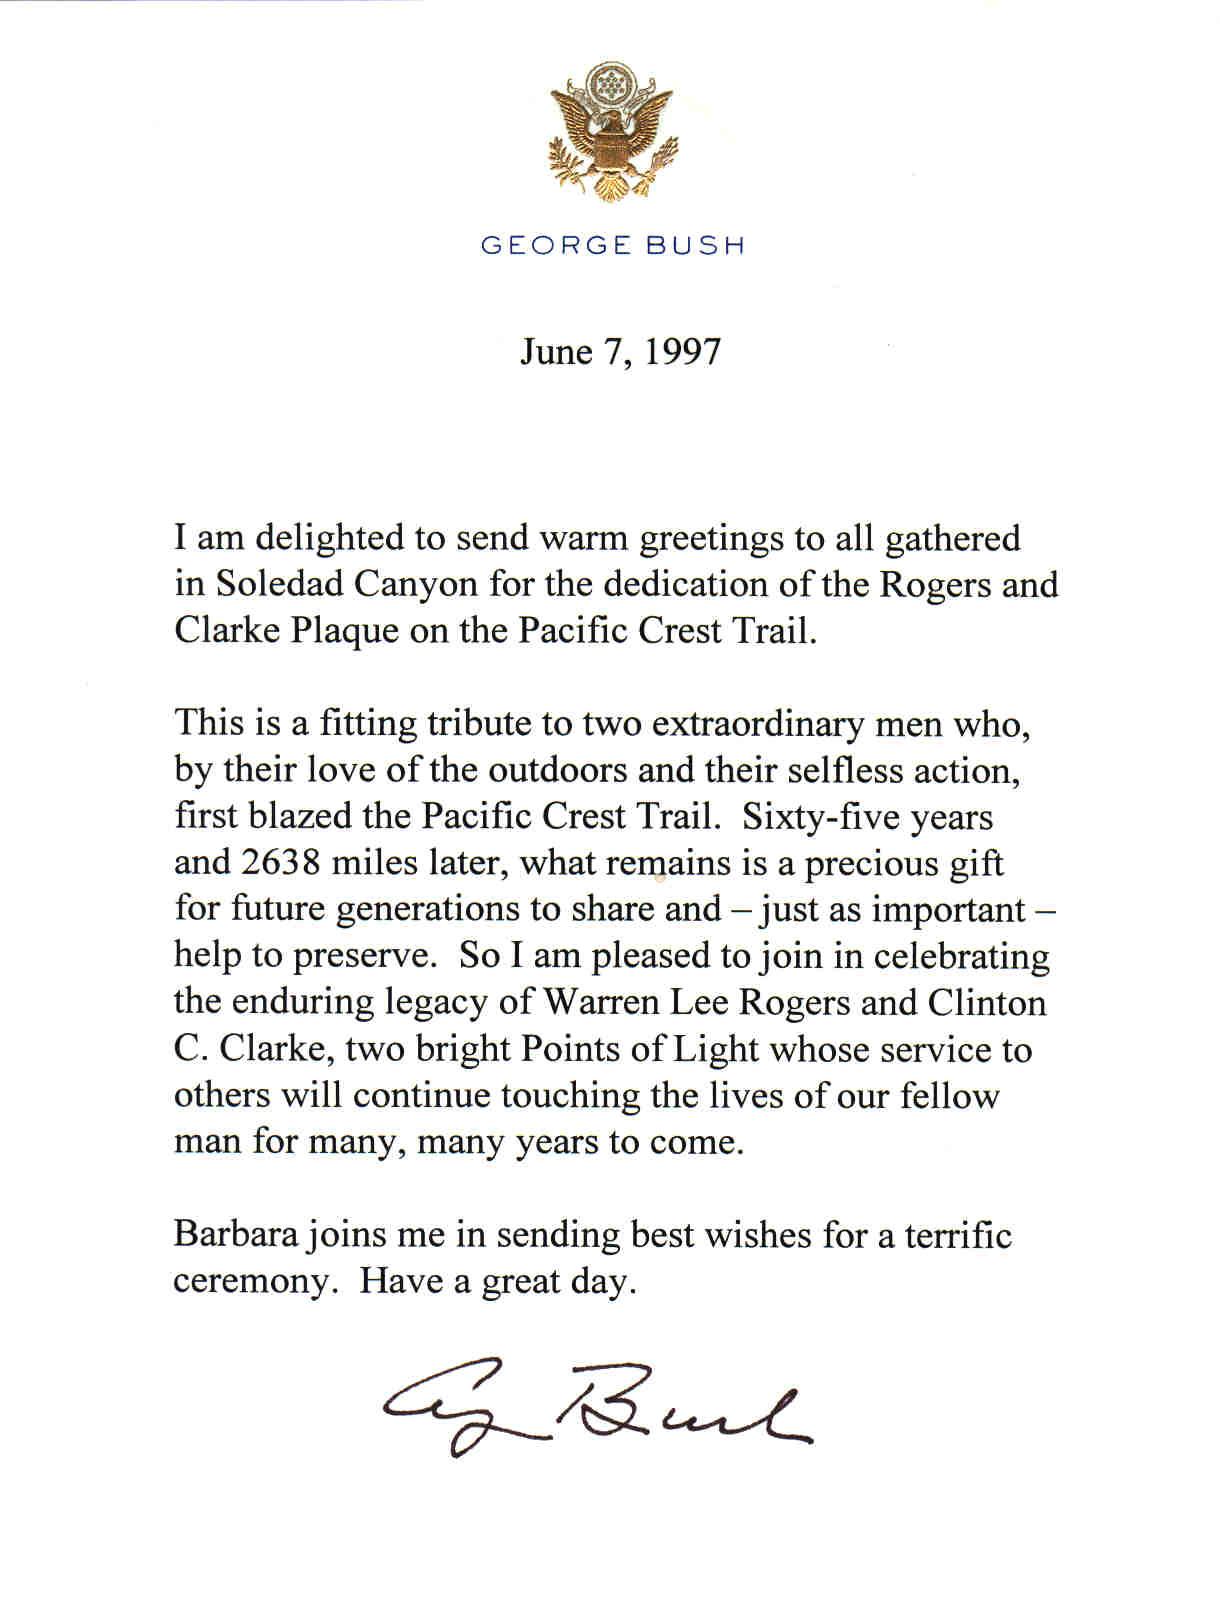 Former President Bushs Letter For National Trails Day June 7 1997